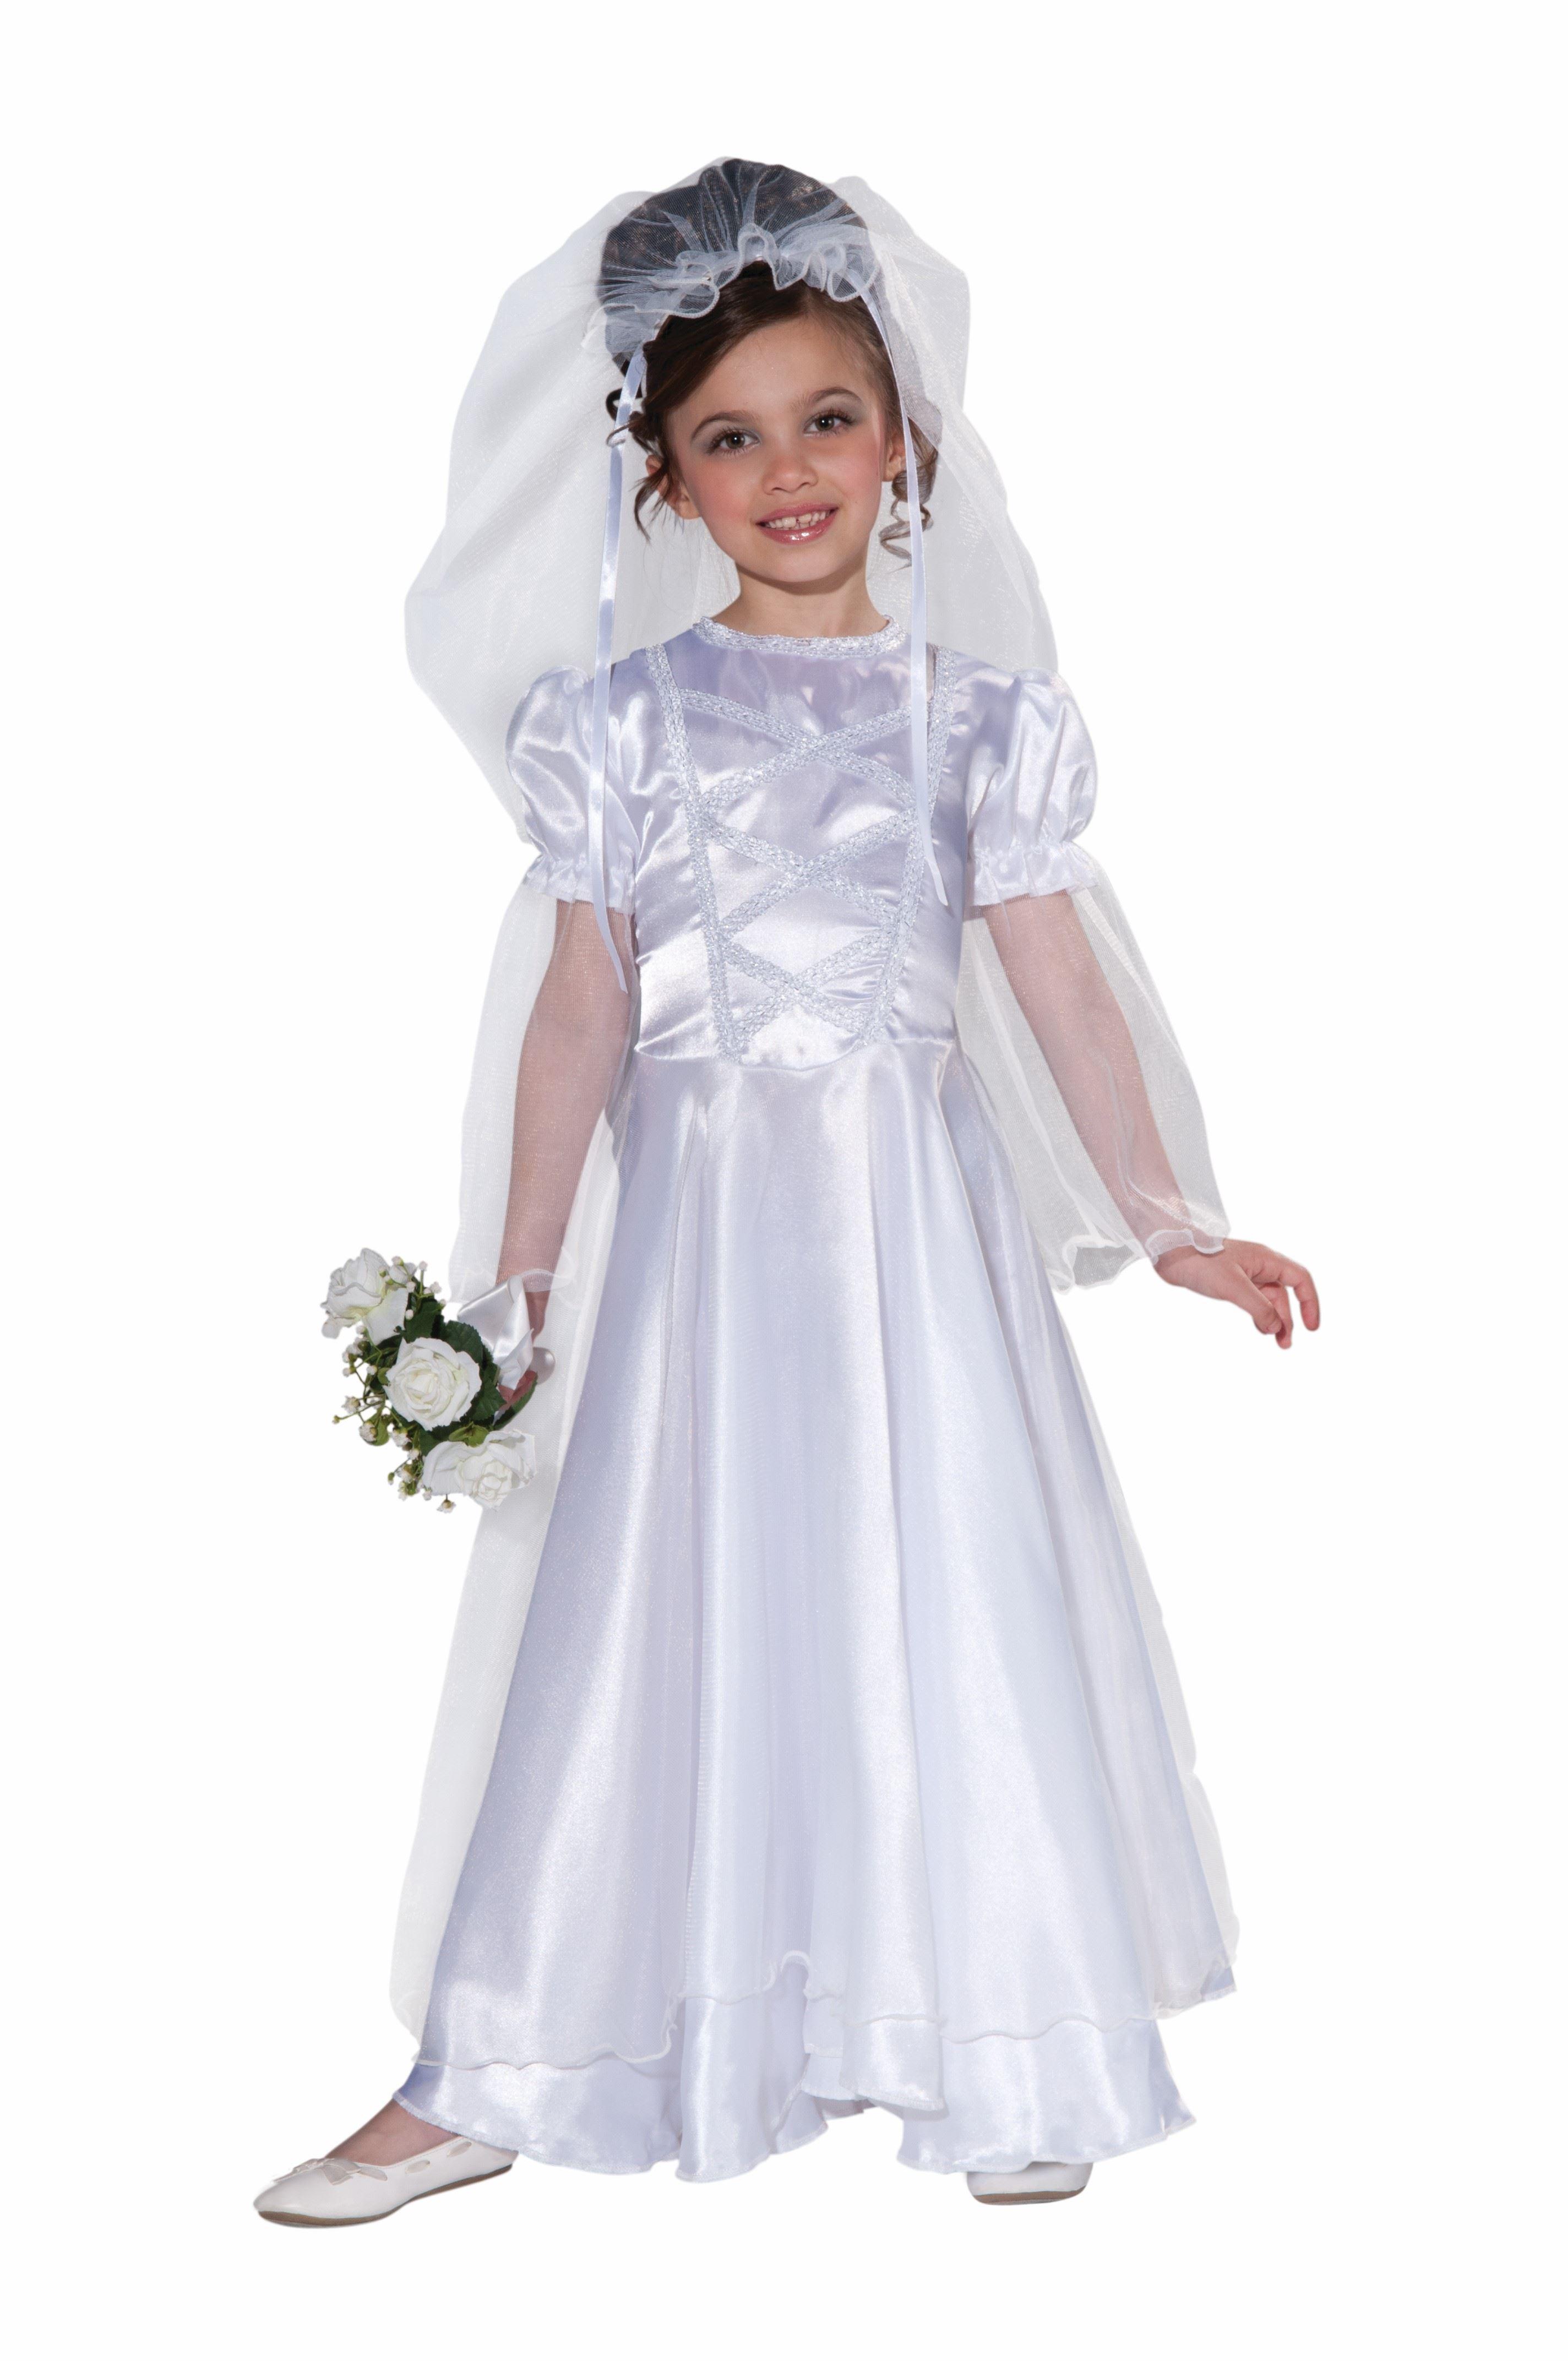 wedding dresses halloween costume halloween wedding dresses Wedding Dresses Halloween Costume